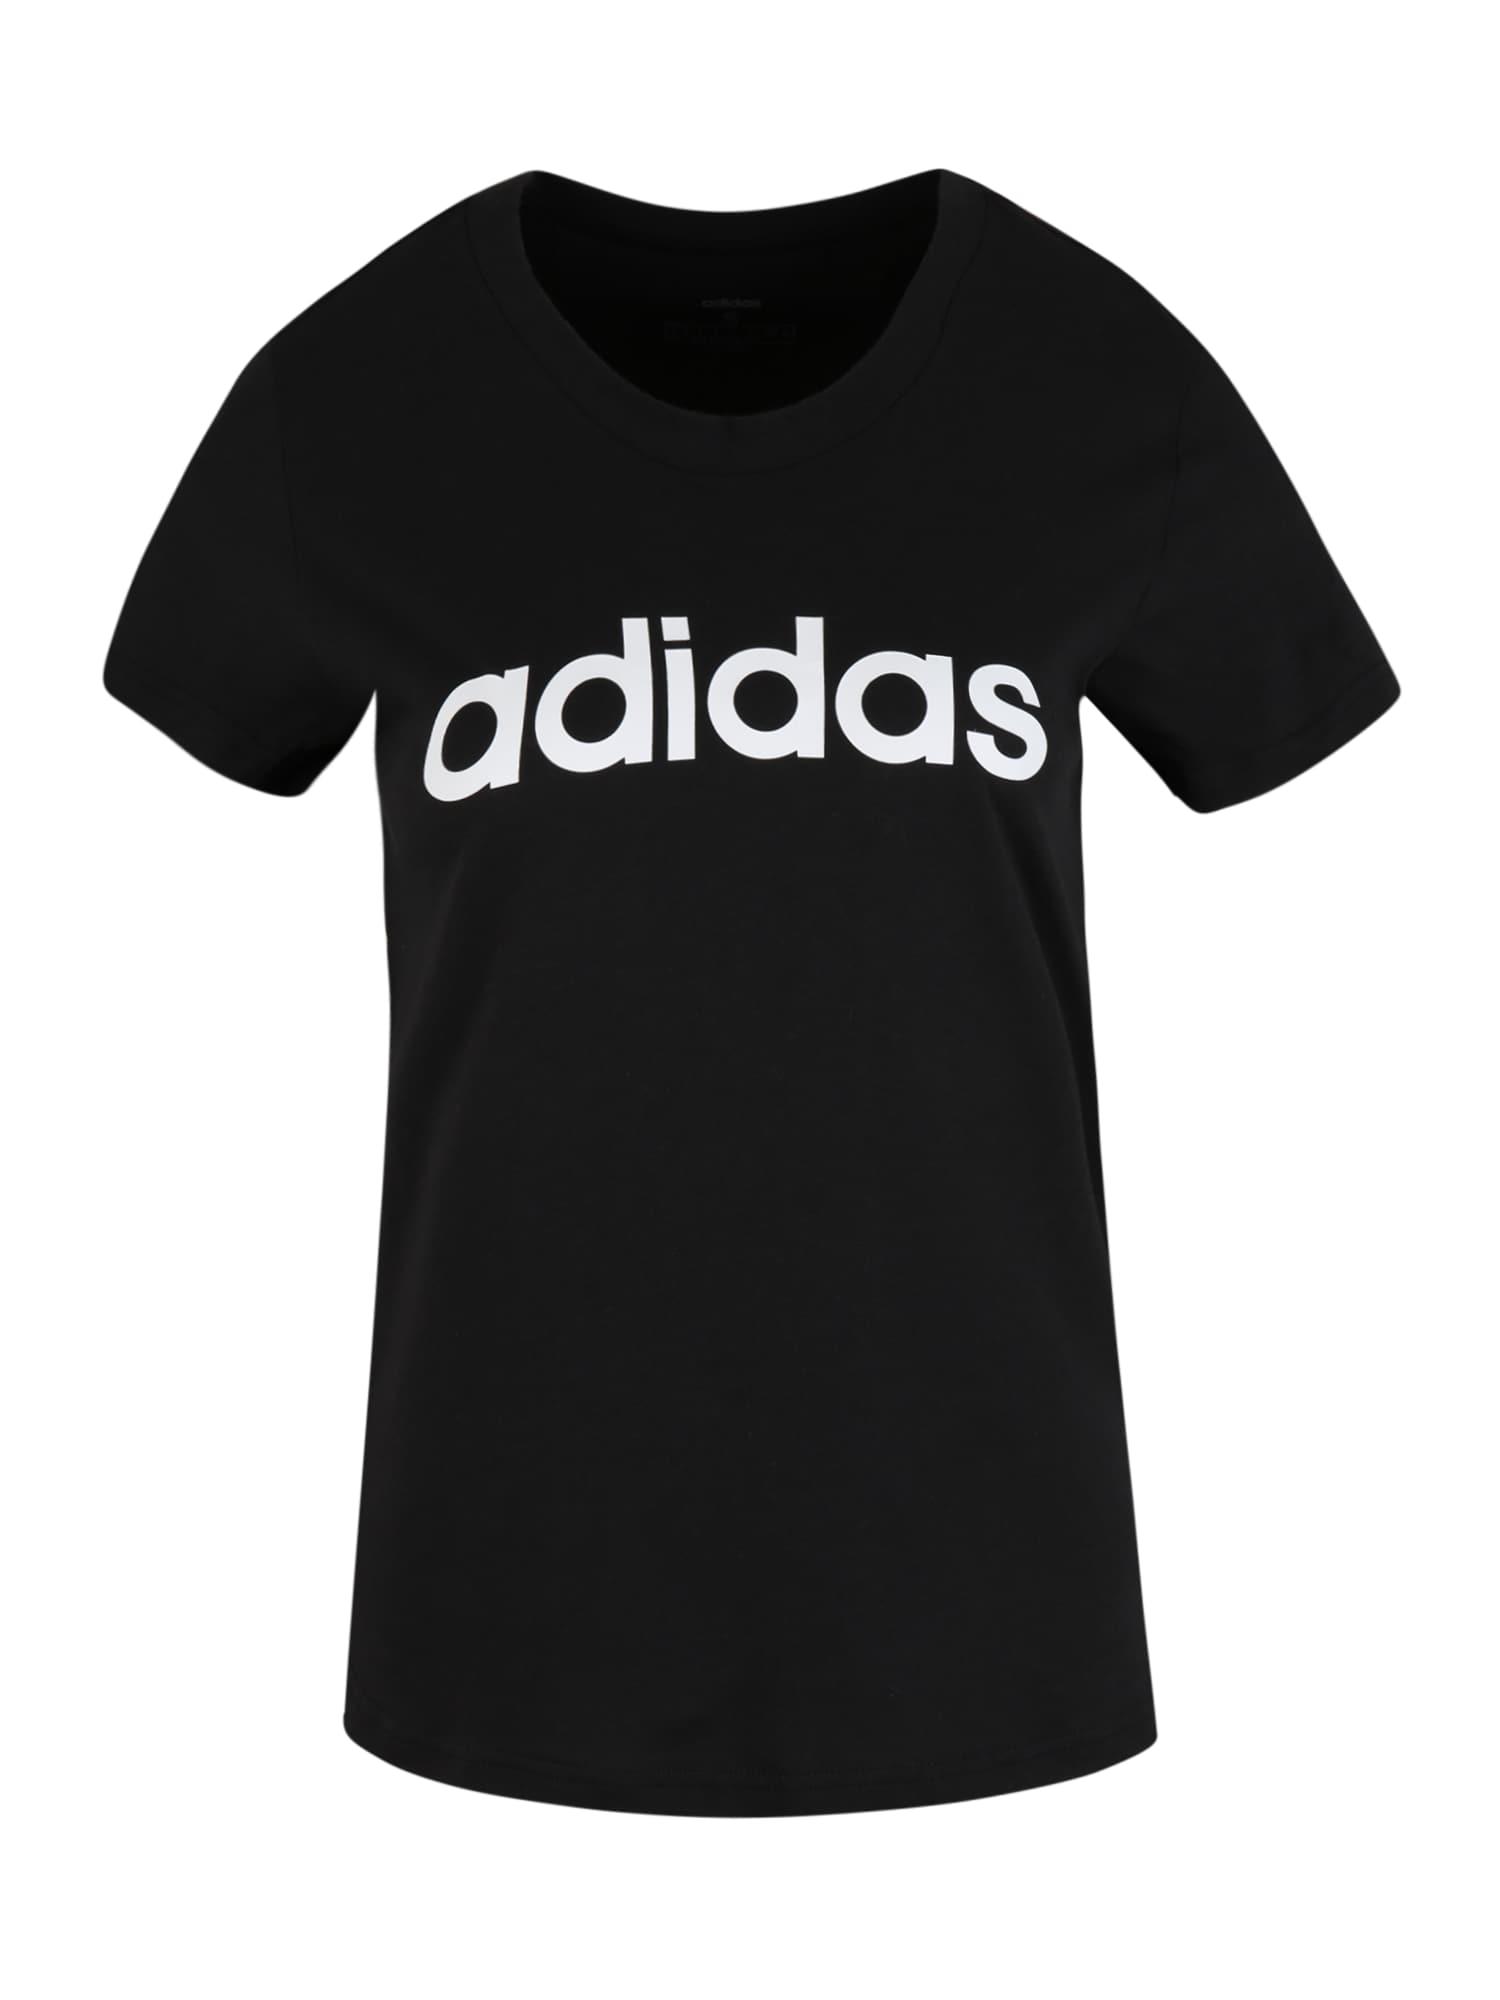 ADIDAS PERFORMANCE T-shirt fonctionnel  - Noir - Taille: S - female